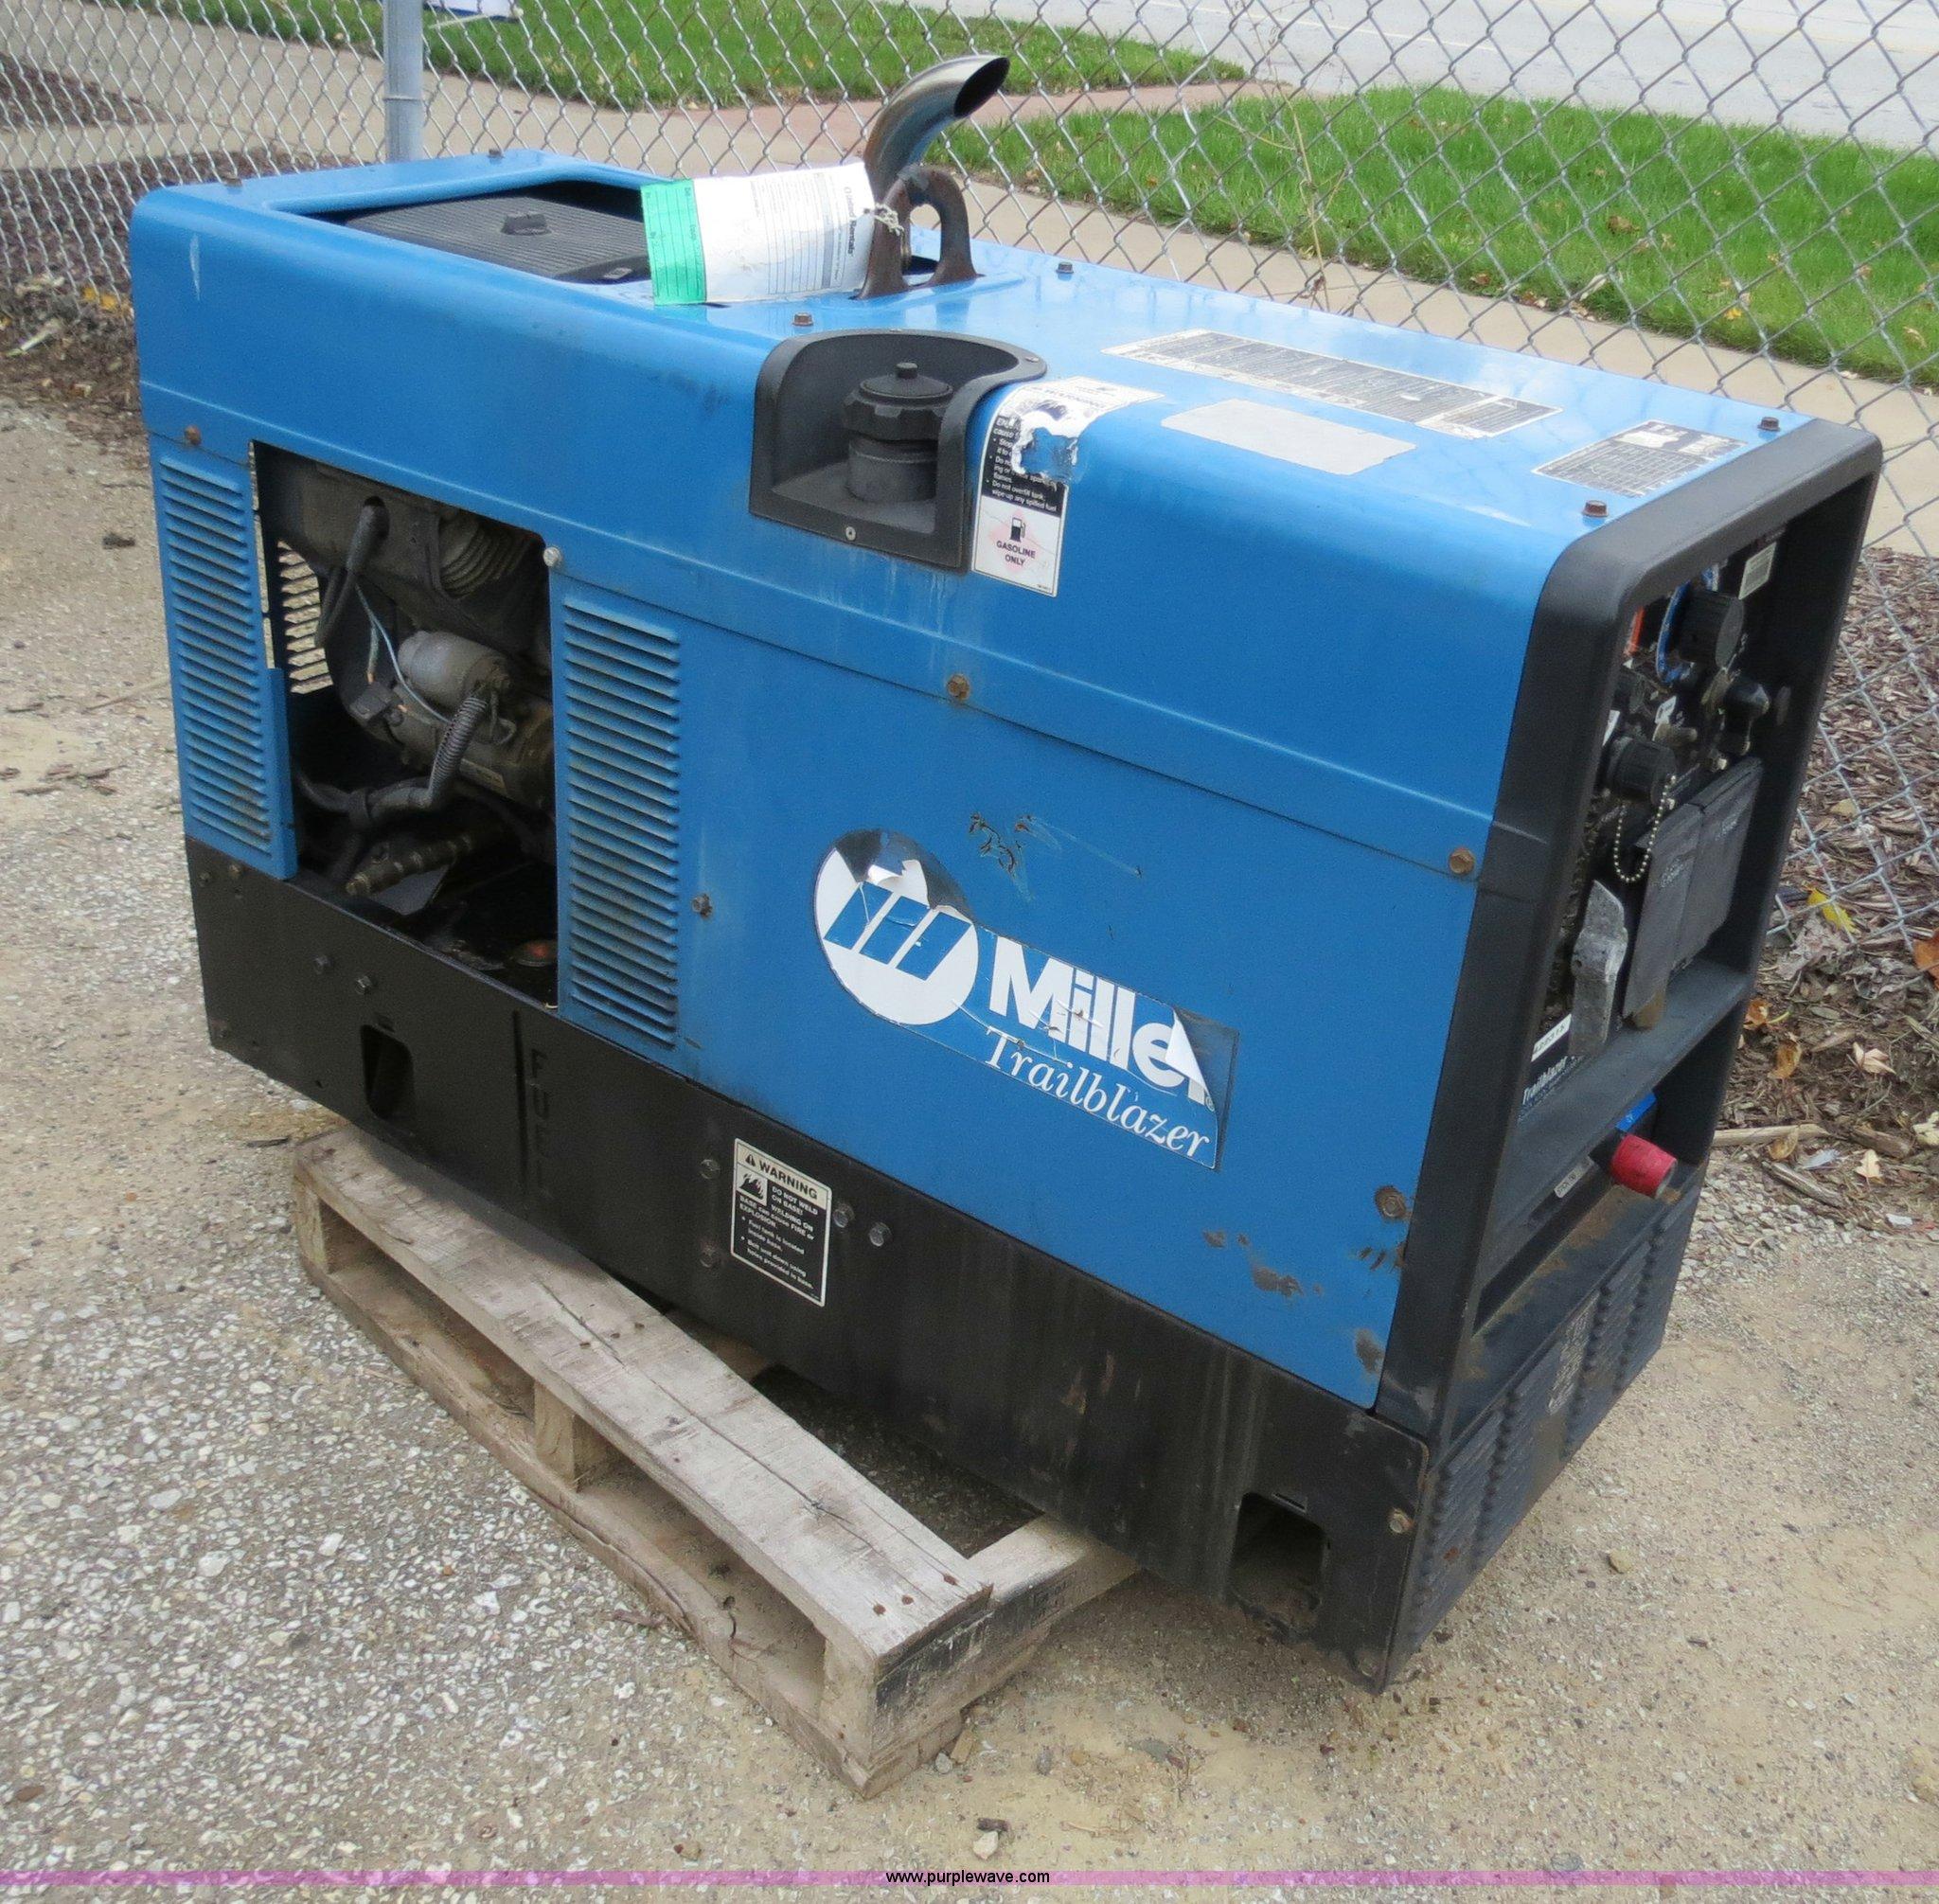 2002 Miller Trailblazer 301g Welder Generator Item B4776 Fuel Filter Full Size In New Window